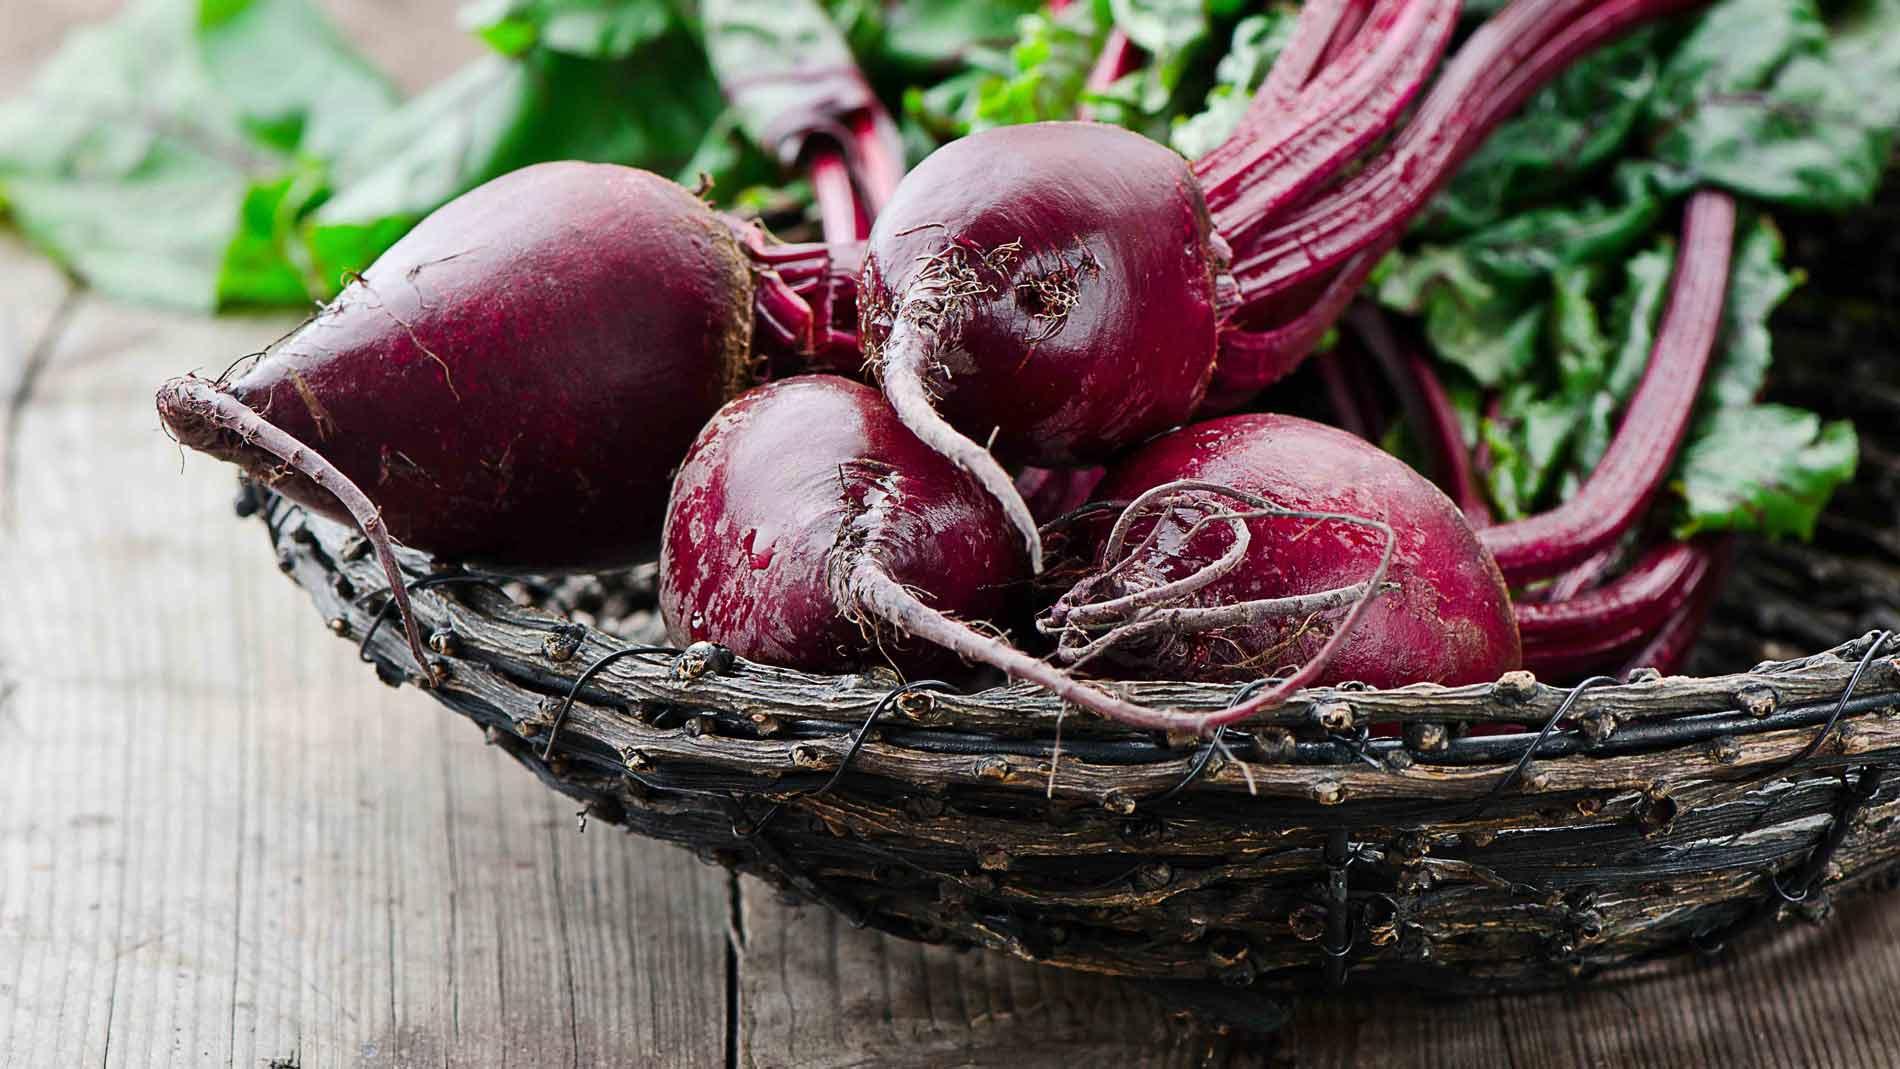 5 superalimentos que deberías comer en primavera